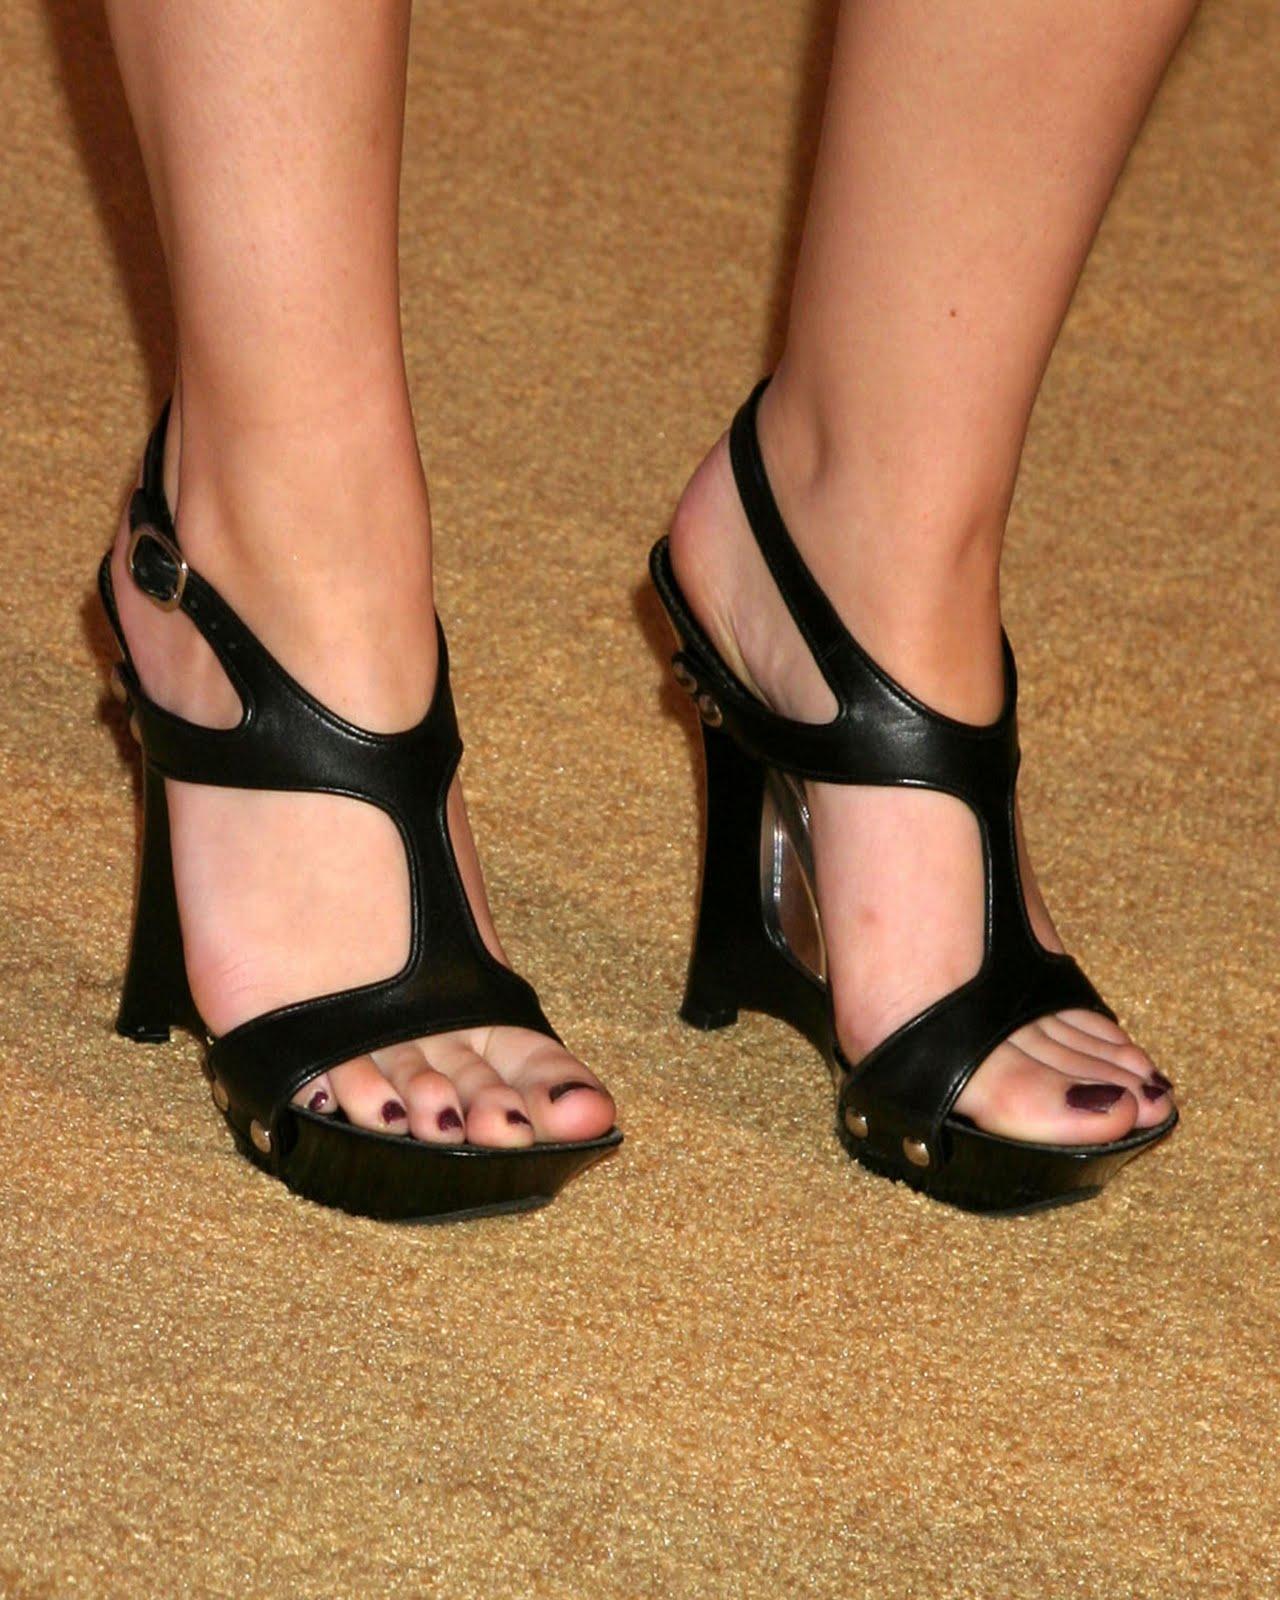 http://2.bp.blogspot.com/_UaLWp72nij4/TC_AU_nhLpI/AAAAAAAAQn8/83xwJ5D6lmE/s1600/renee-olstead-feet-2.jpg